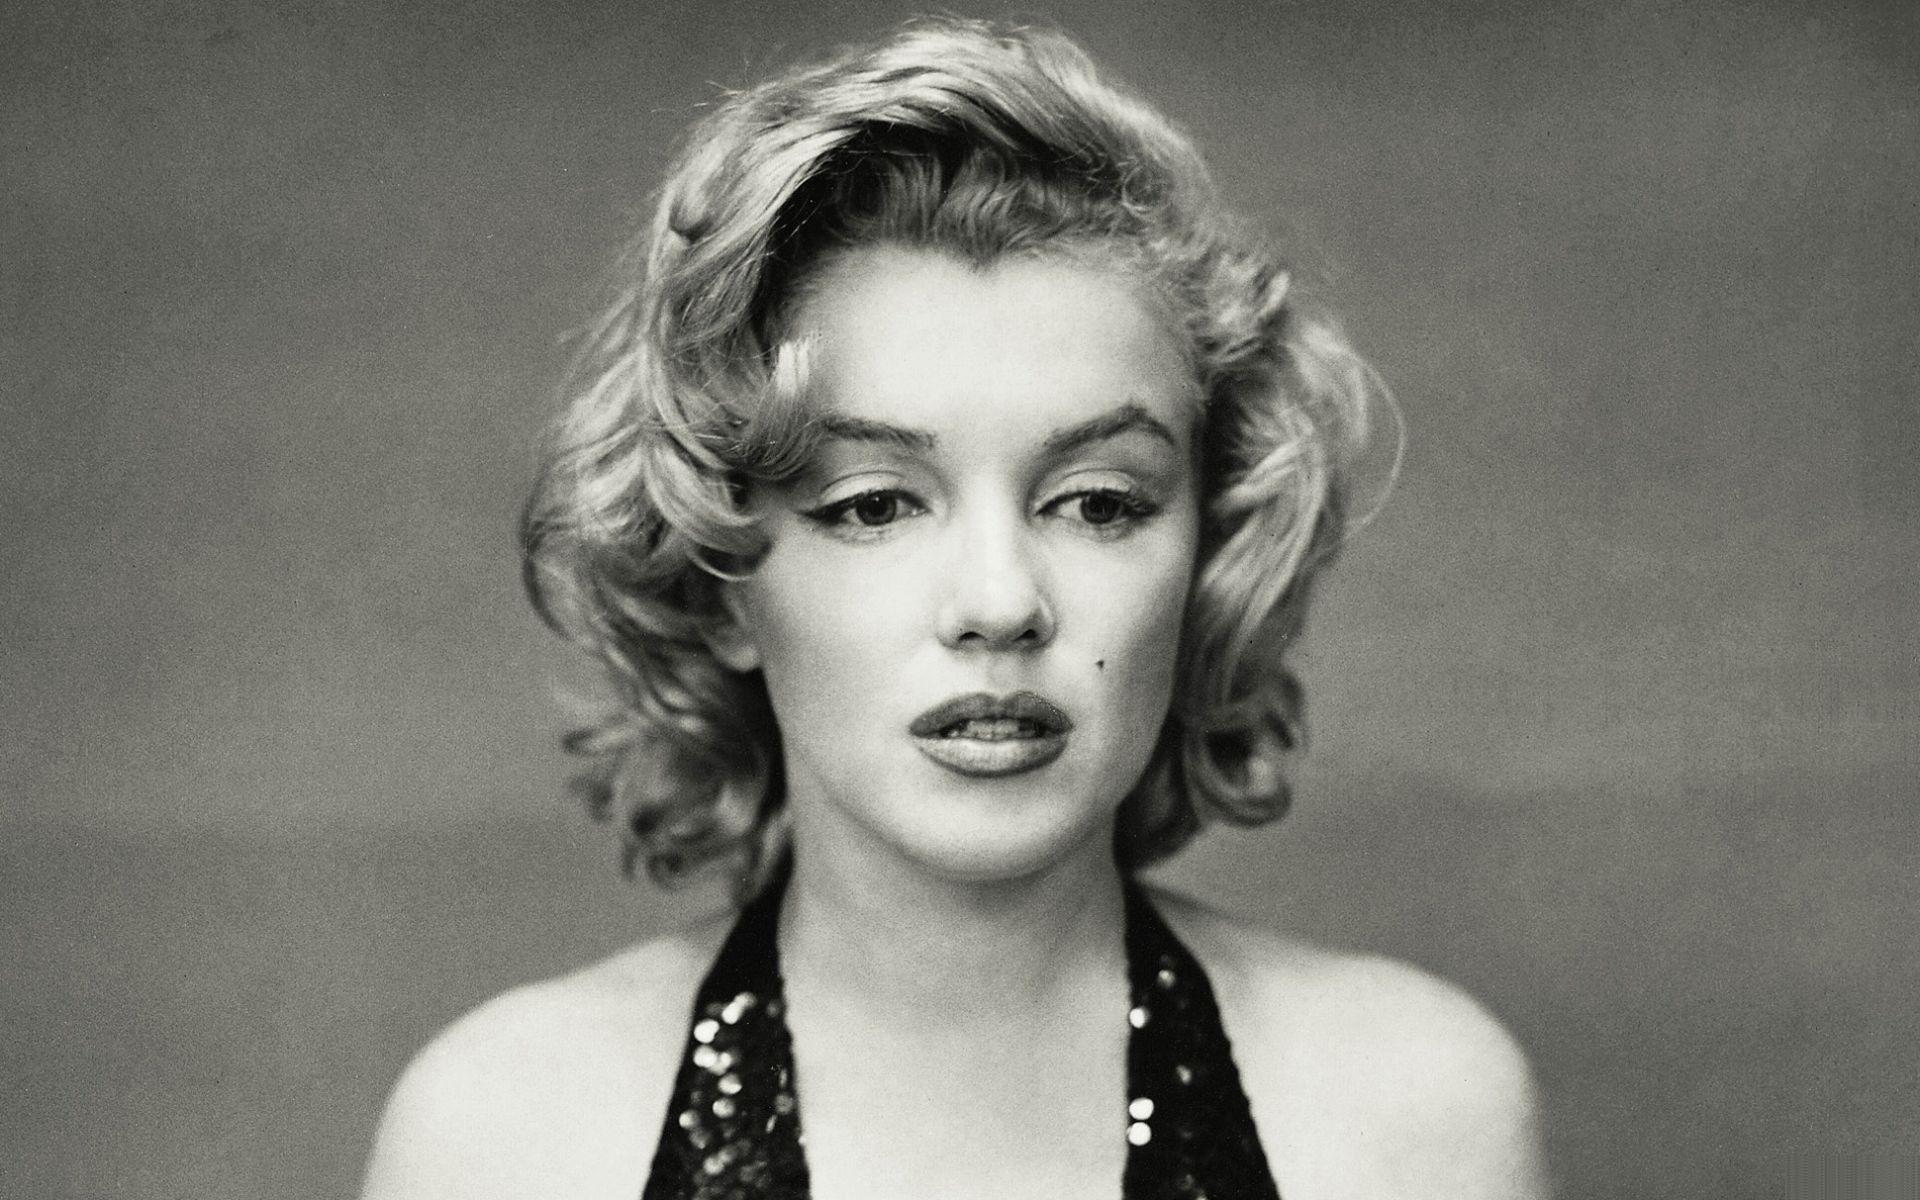 Marilyn Monroe James Dean Wallpaper 39 Images